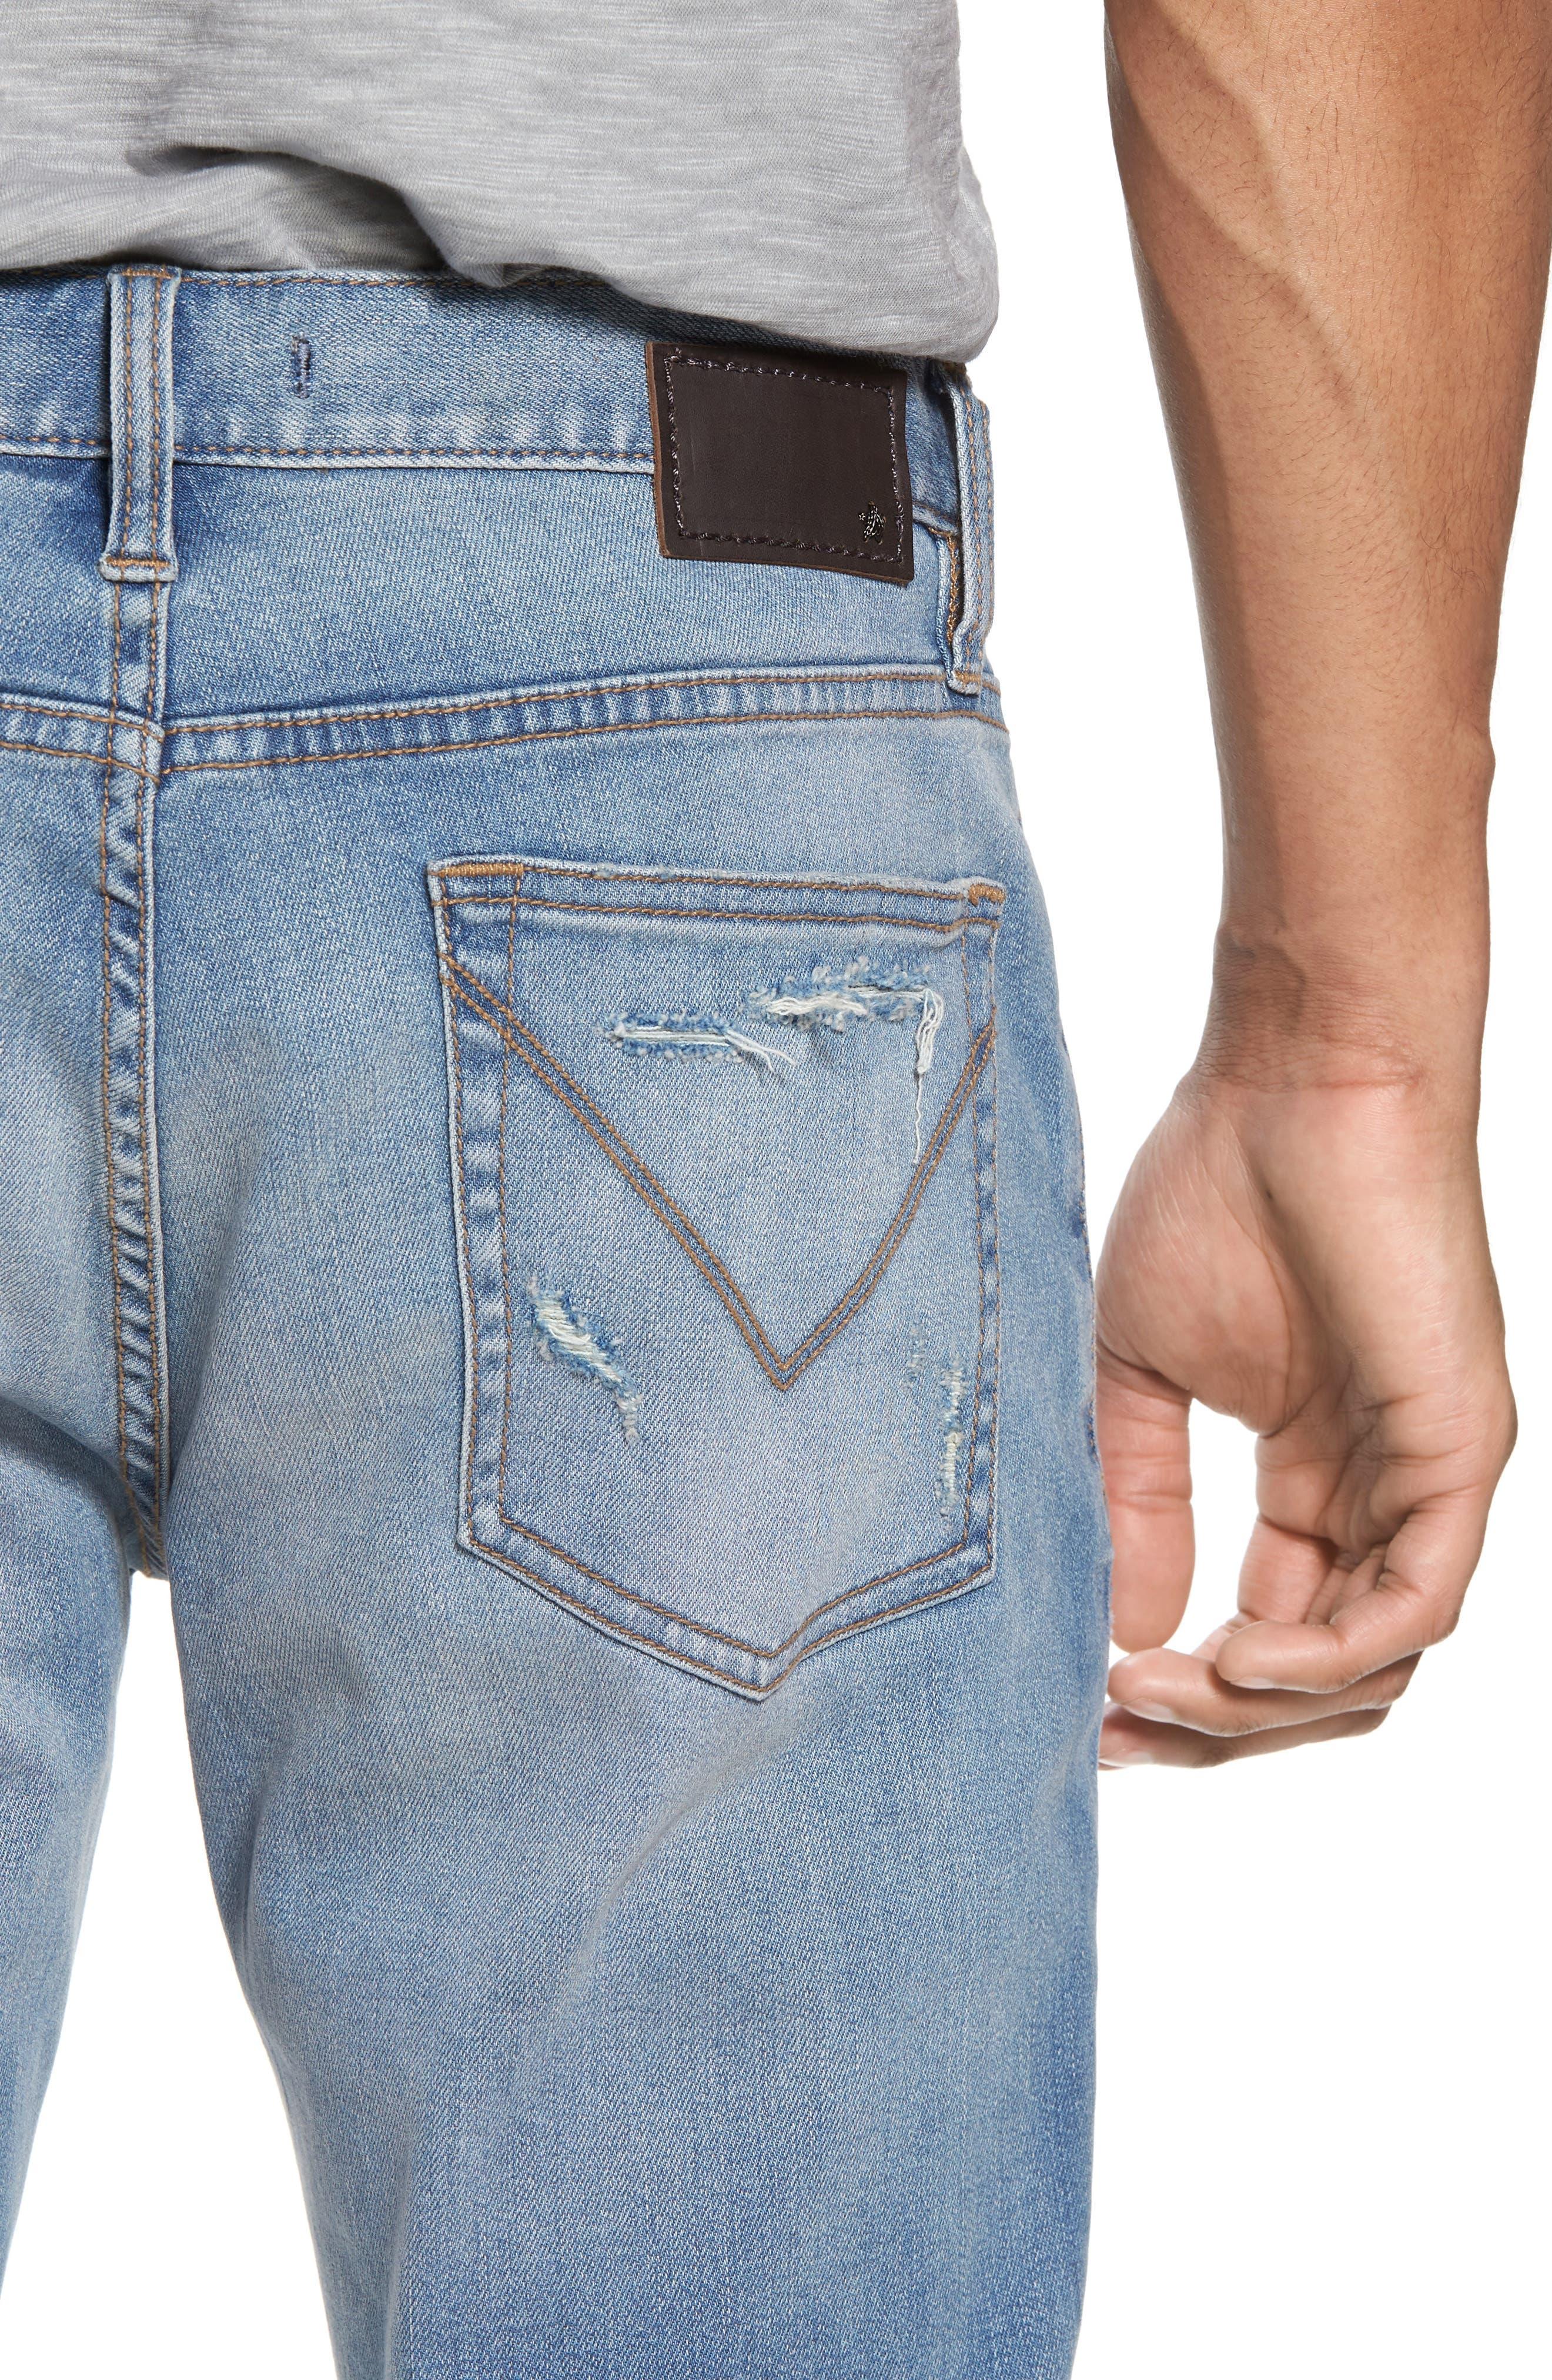 Wight Slim Fit Straight Leg Jeans,                             Alternate thumbnail 4, color,                             Atlantic Blue